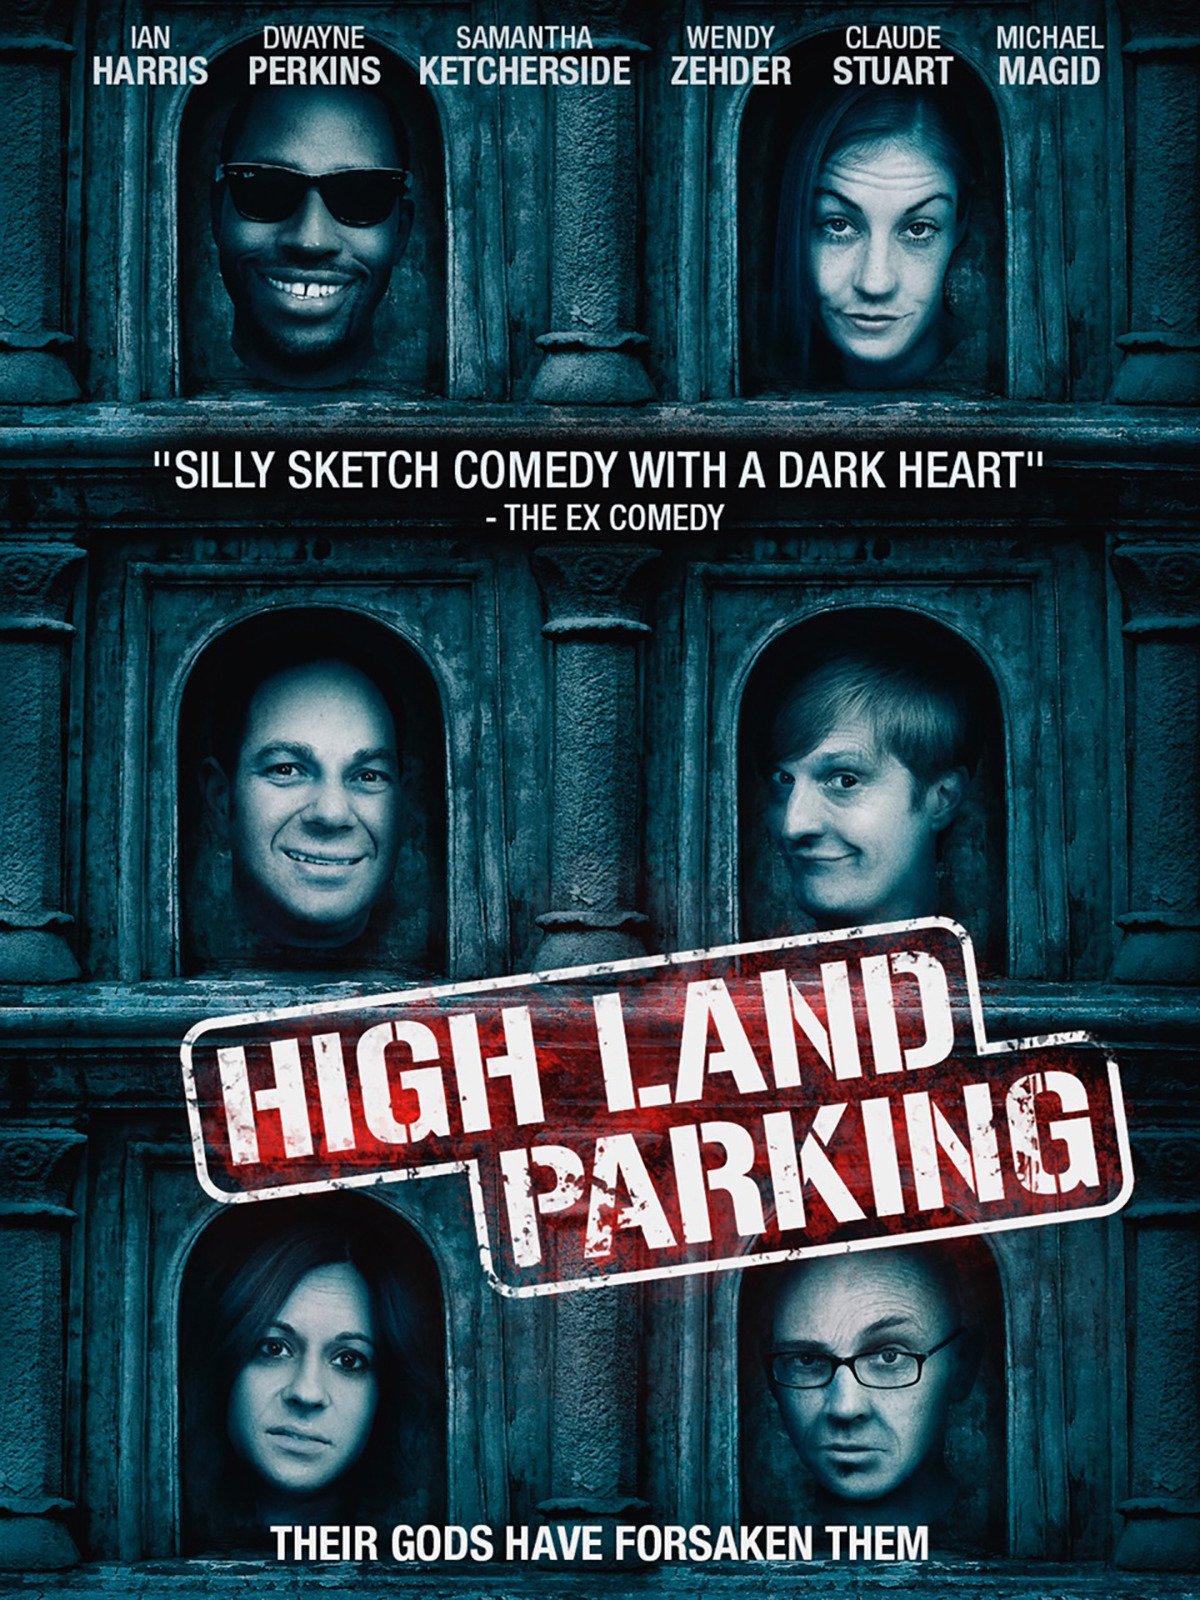 High Land Parking